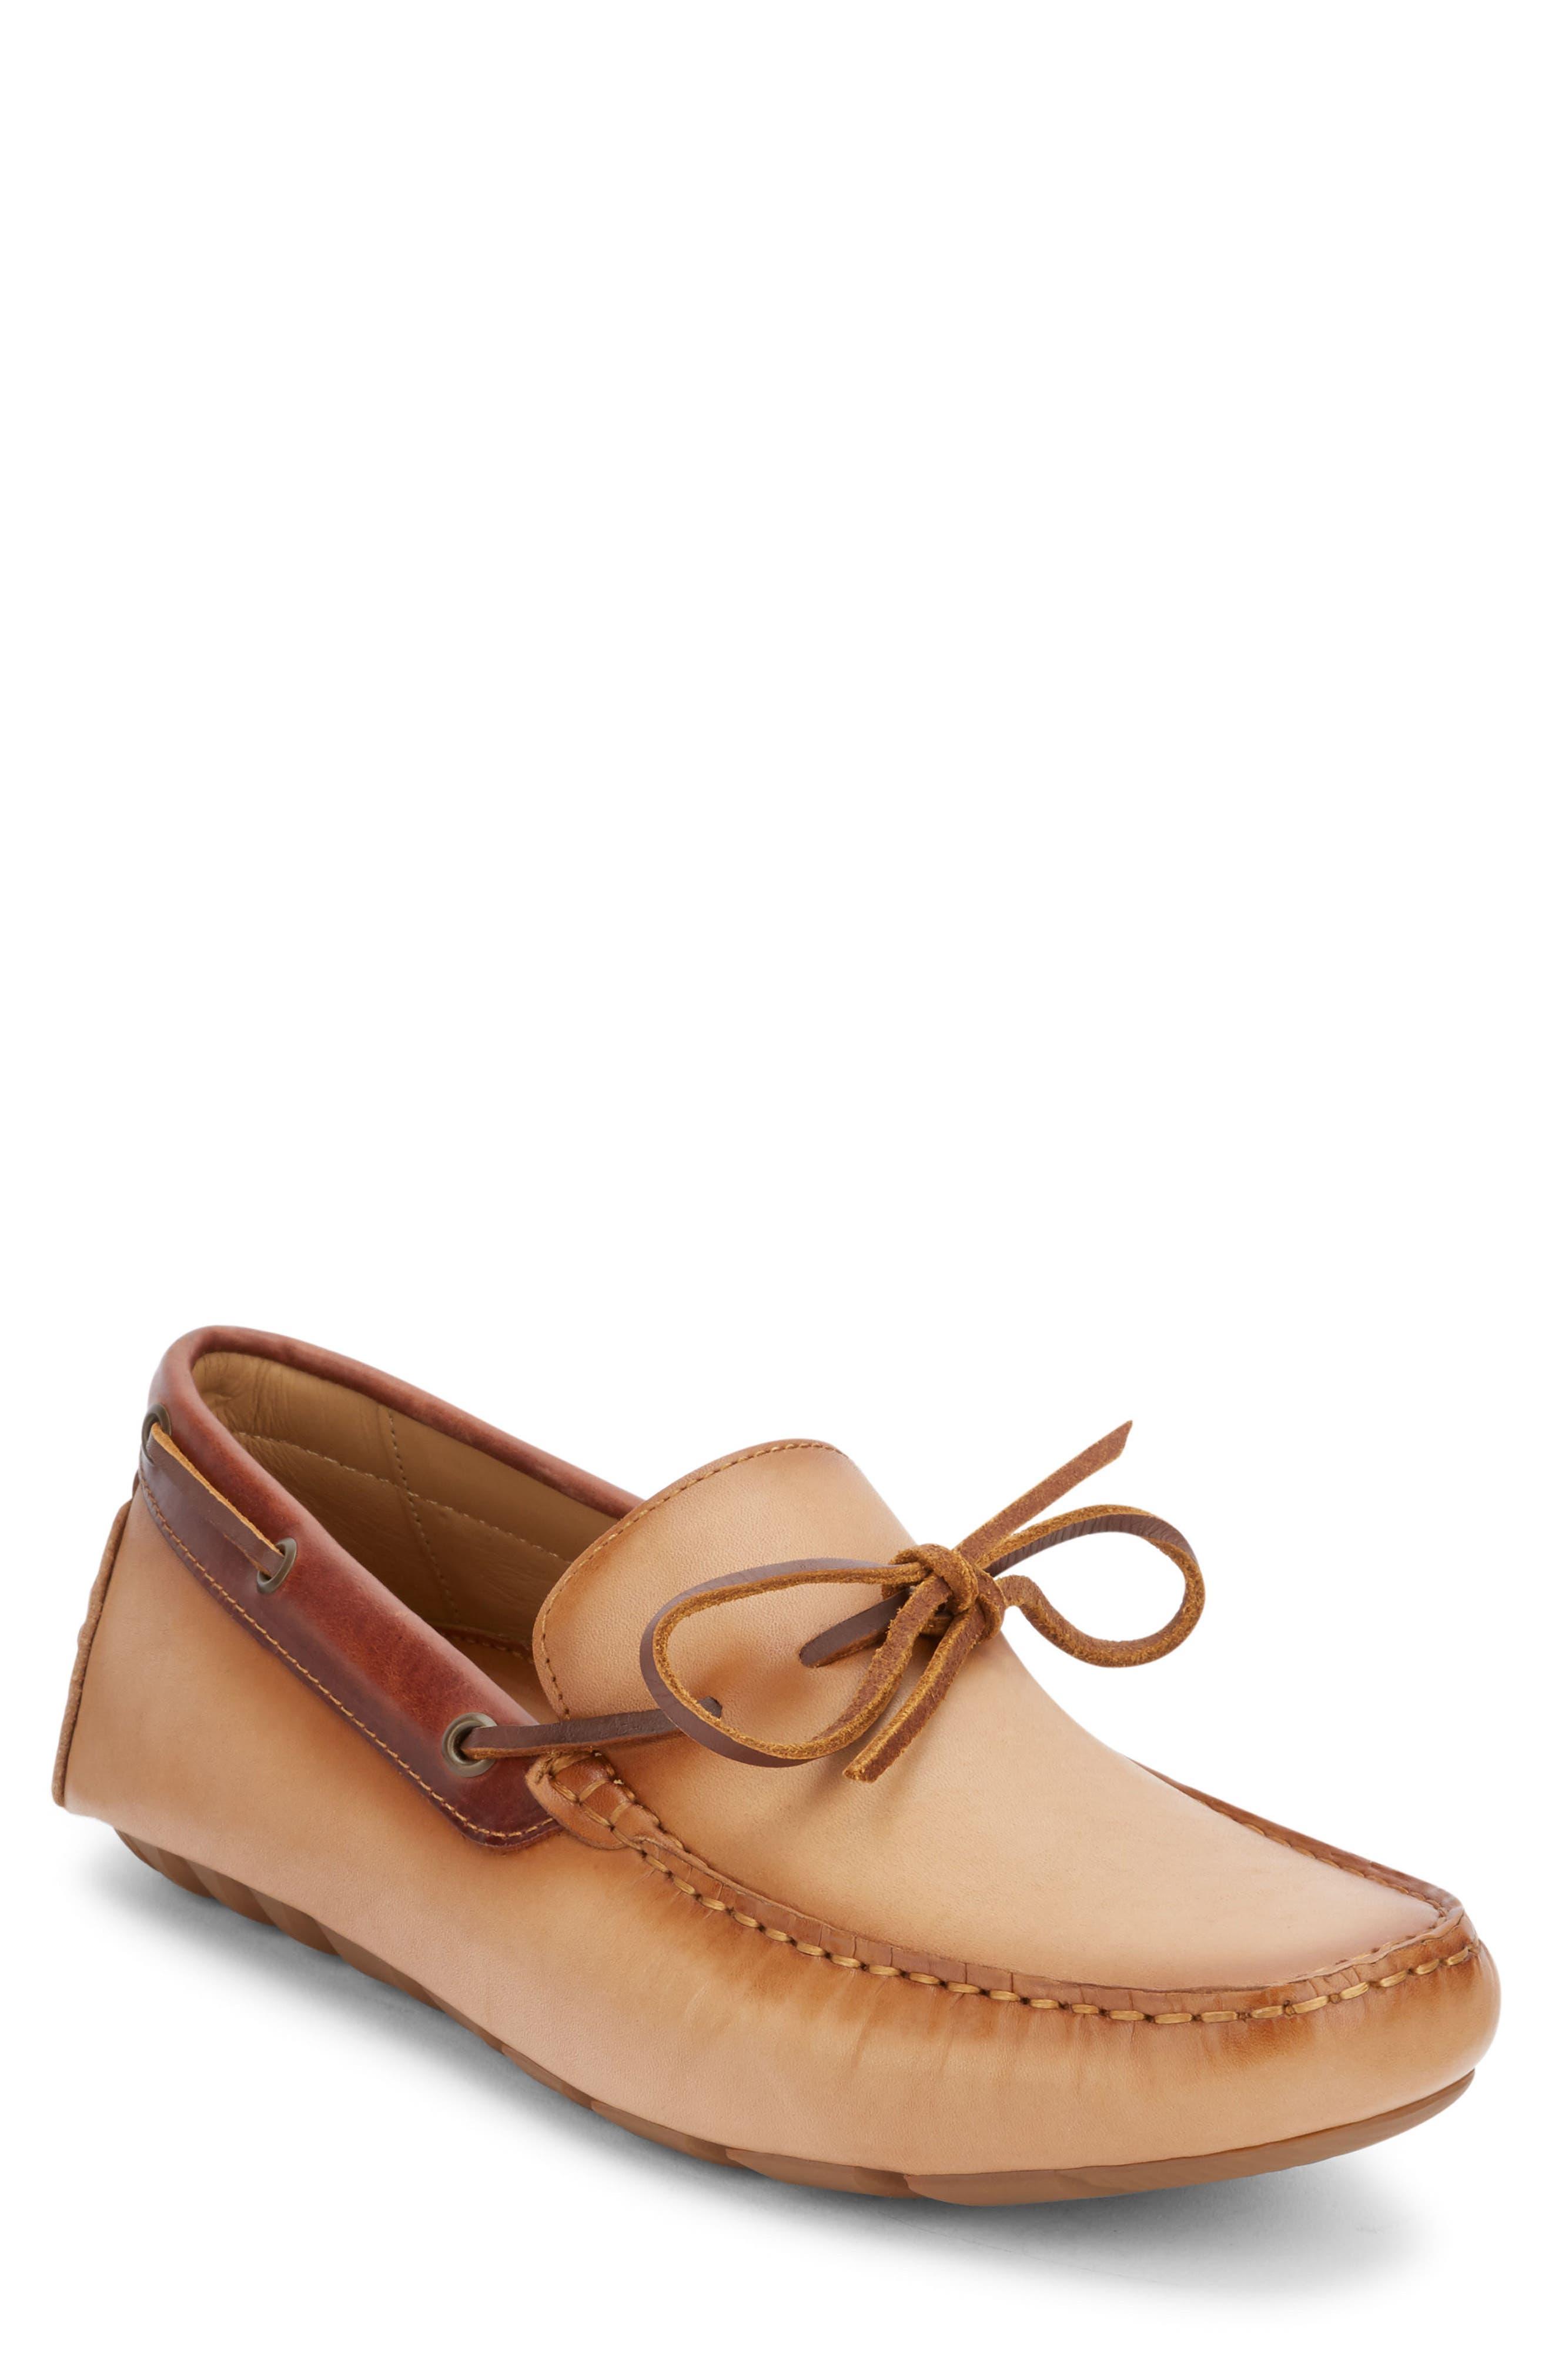 Wyatt Driving Shoe,                         Main,                         color, VACHETTA LEATHER